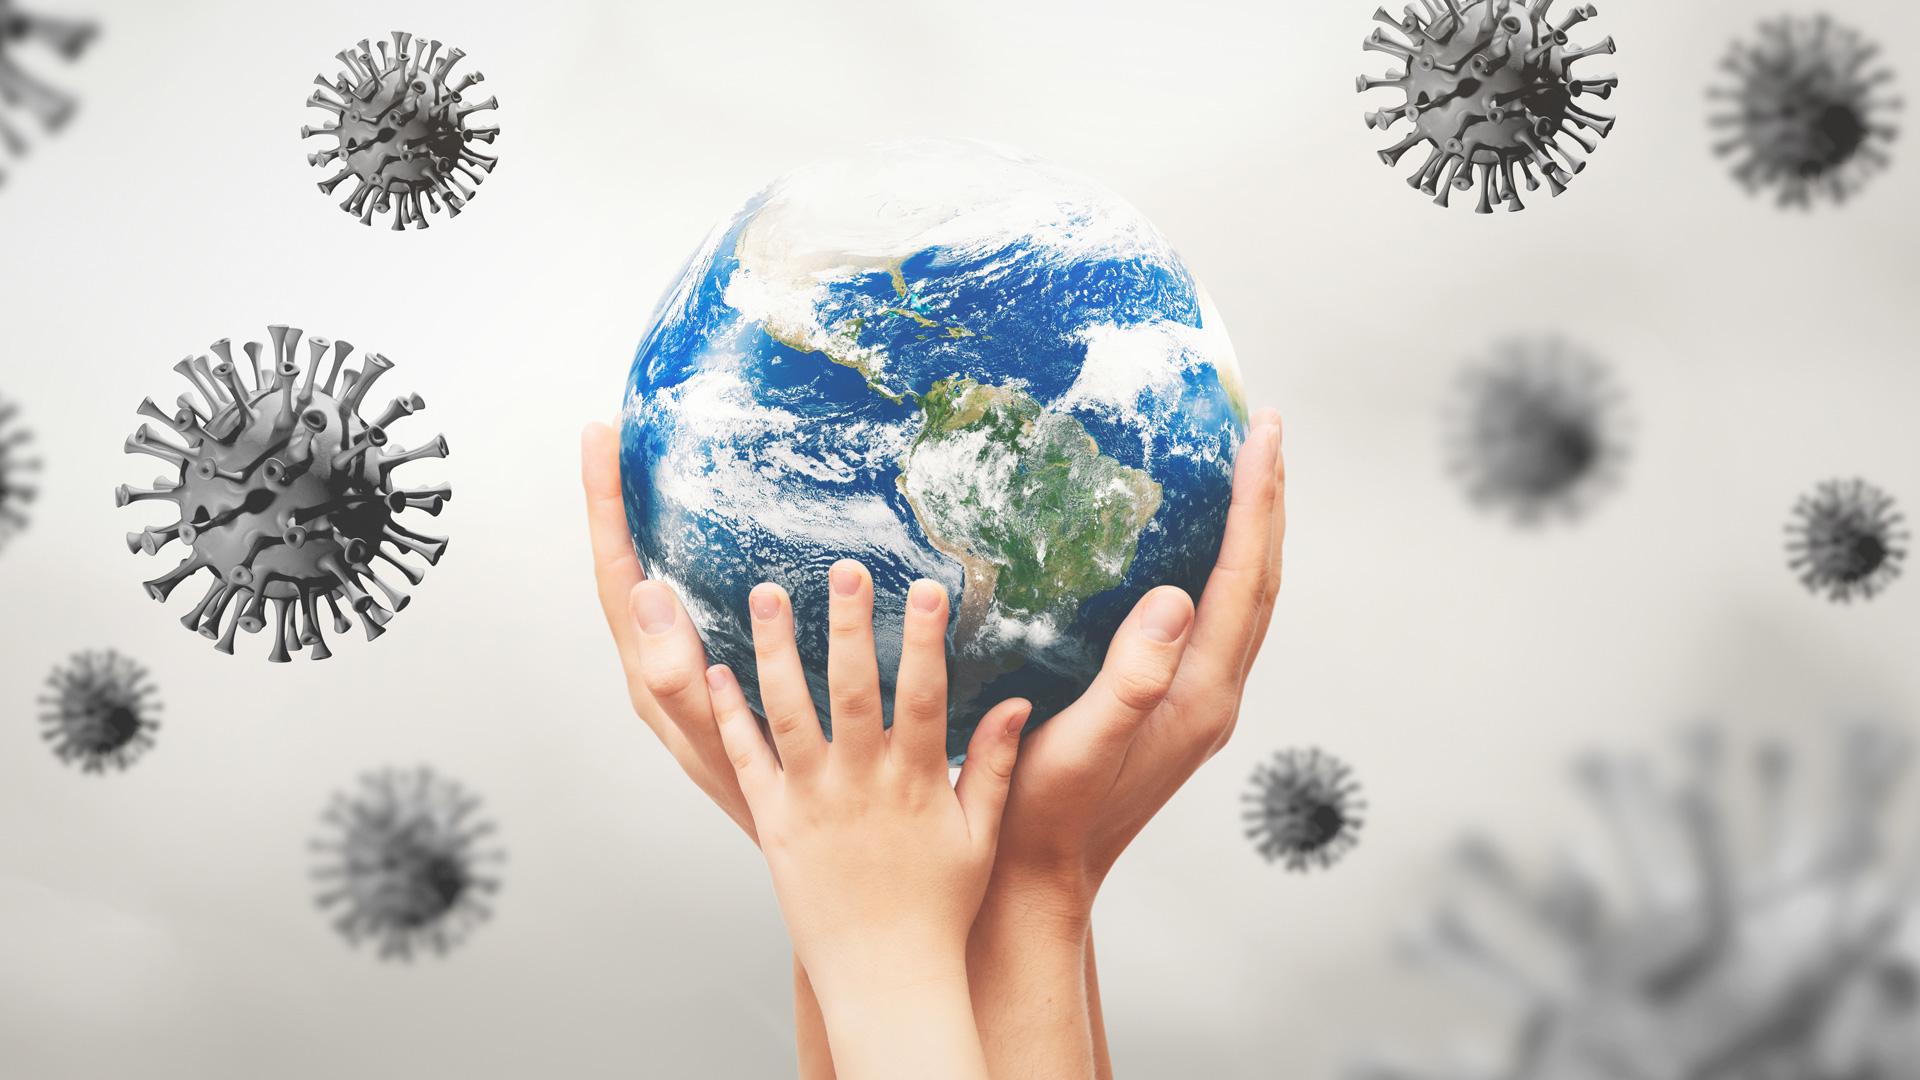 Viruses around the earth globe, world pandemic